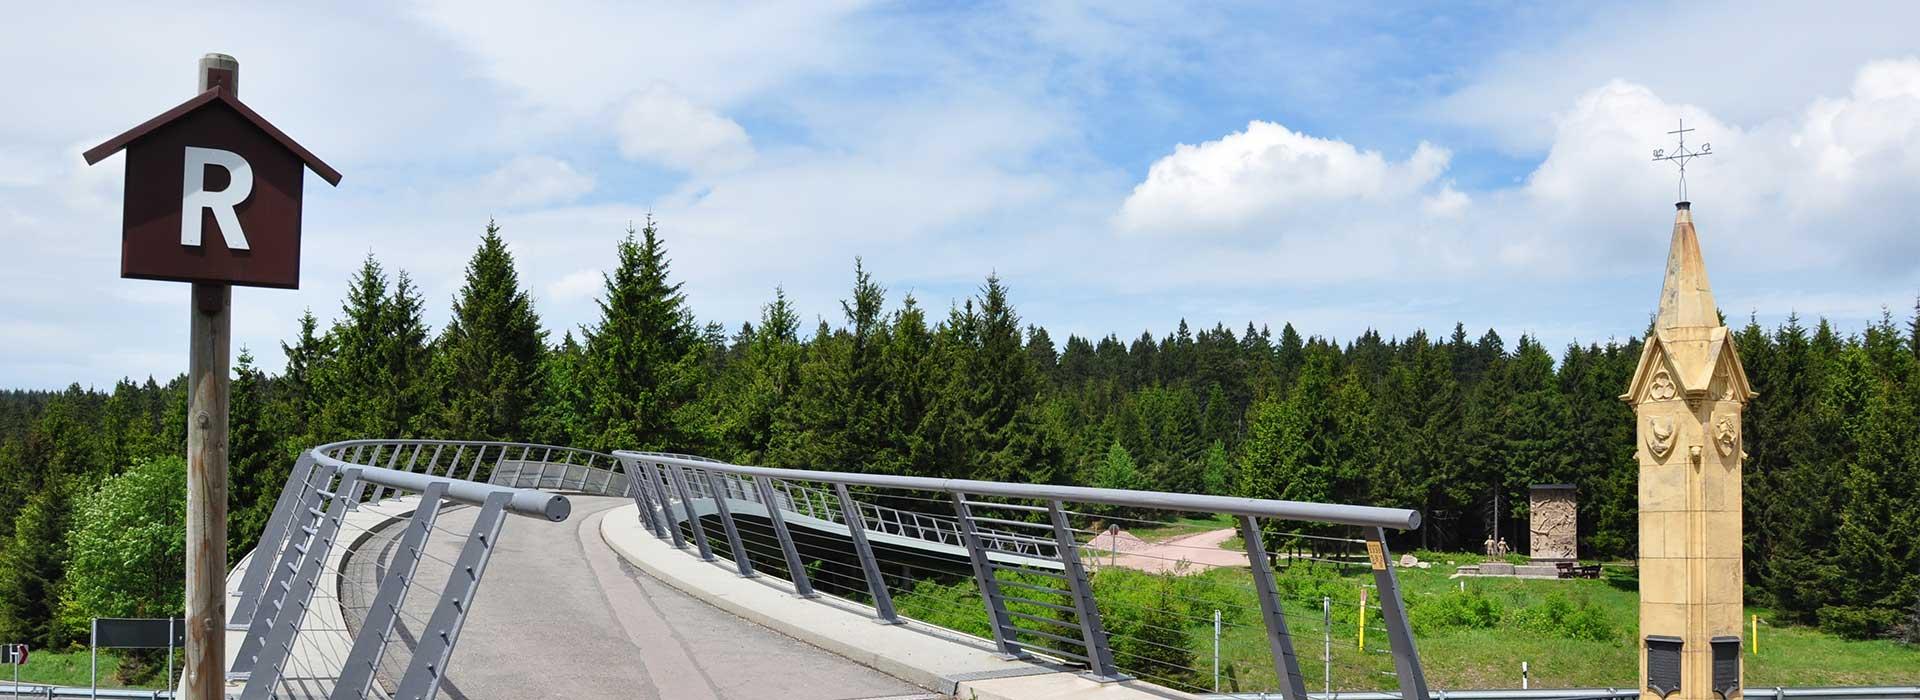 Rennsteig Übergang am Rondell bei Oberhof | Urlaub in Oberhof buchen